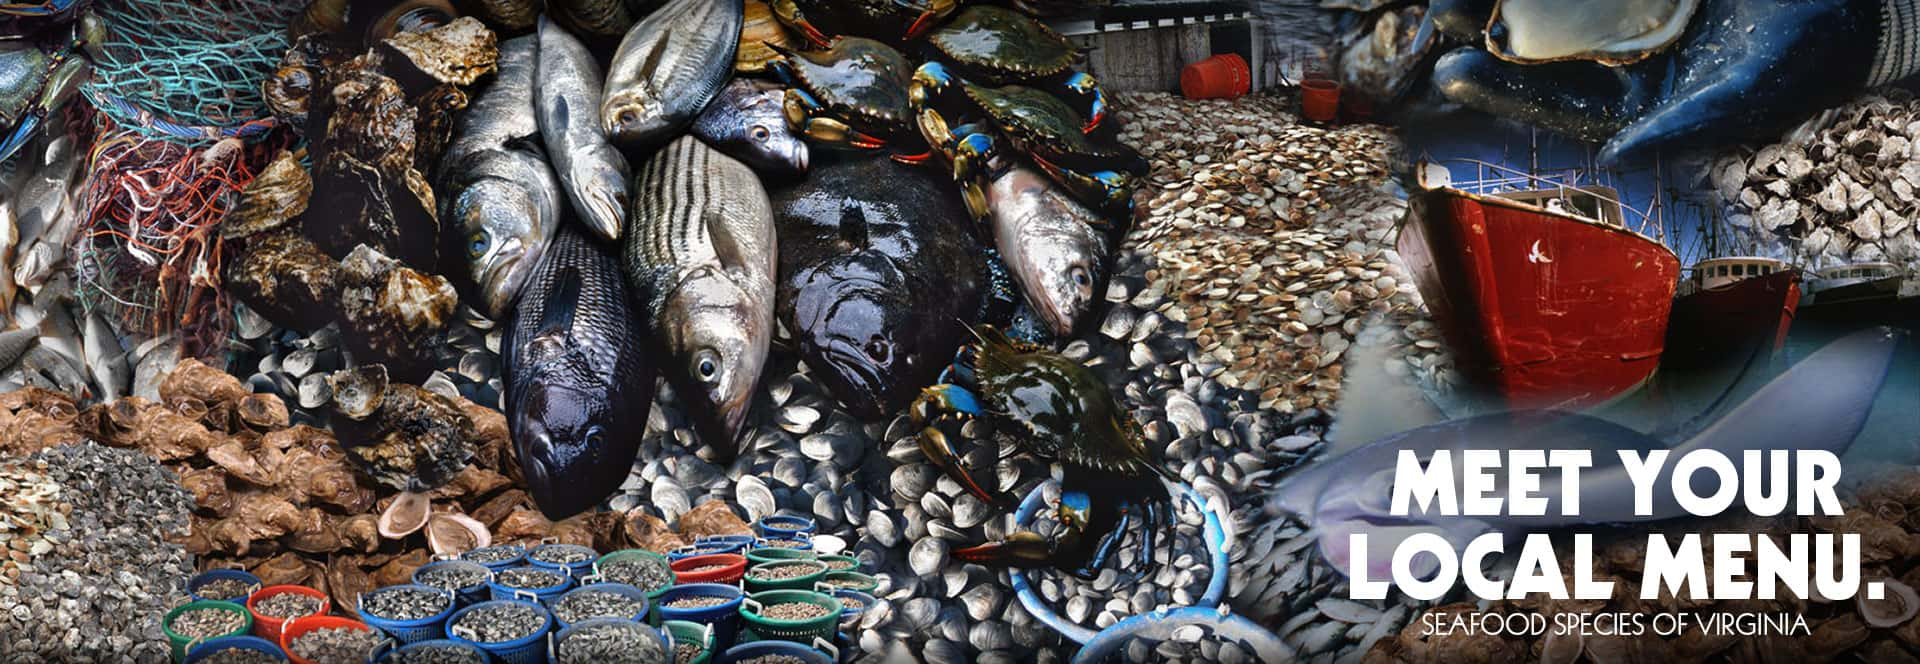 Meet Your Local Menu — seafood species of Virginia.